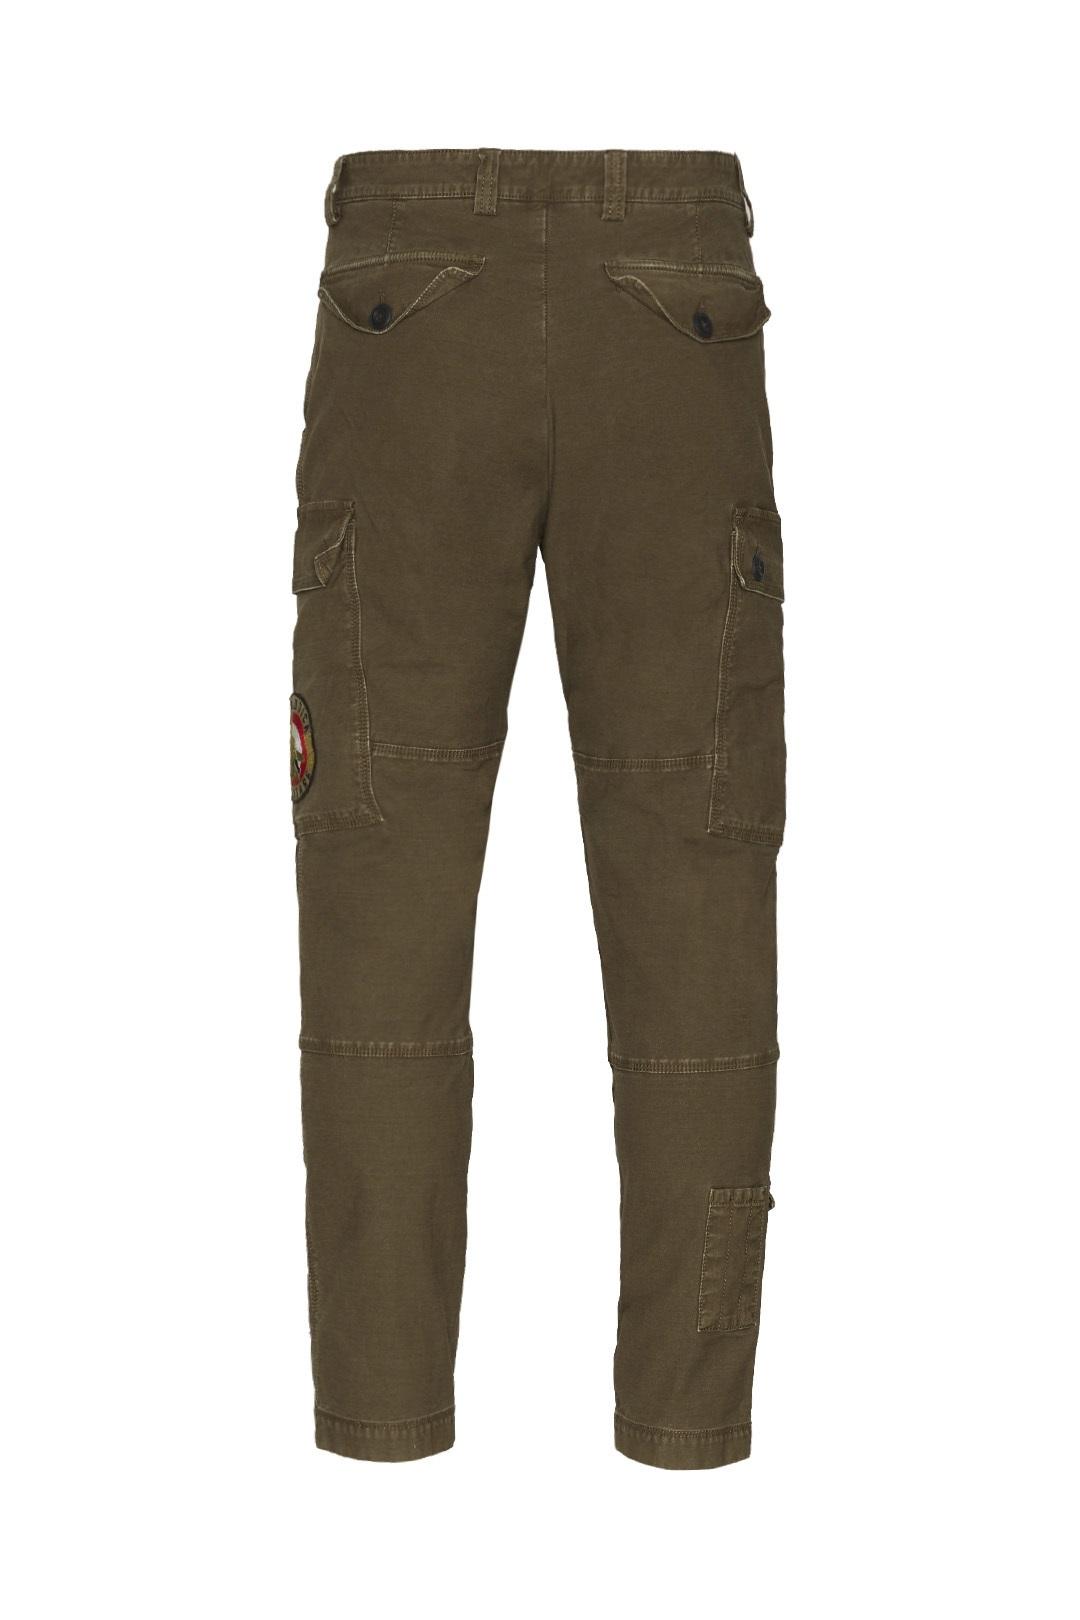 Pantalon avec petite poche bas de jambe  2